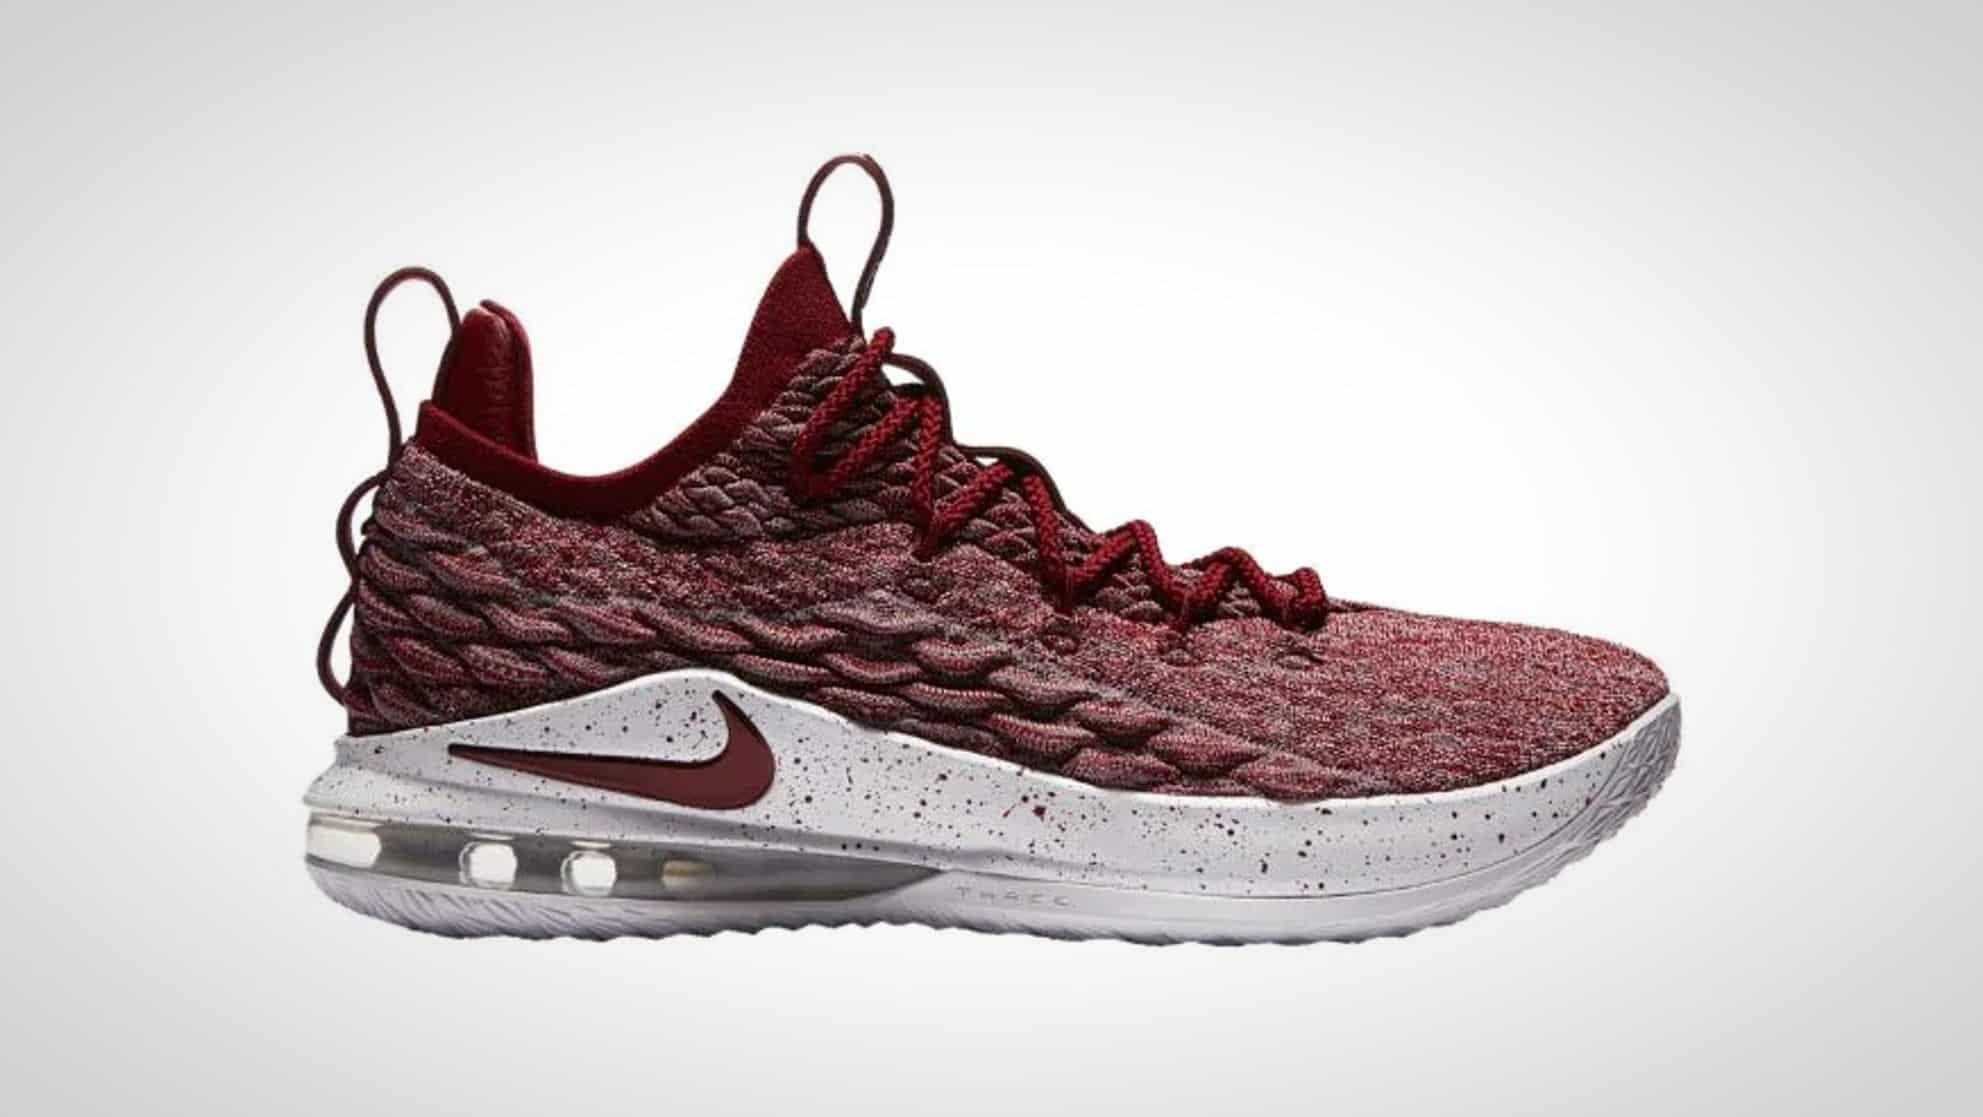 04893d72480 Nike Lebron 15 Low Shoe Review - BestOutdoorBasketball